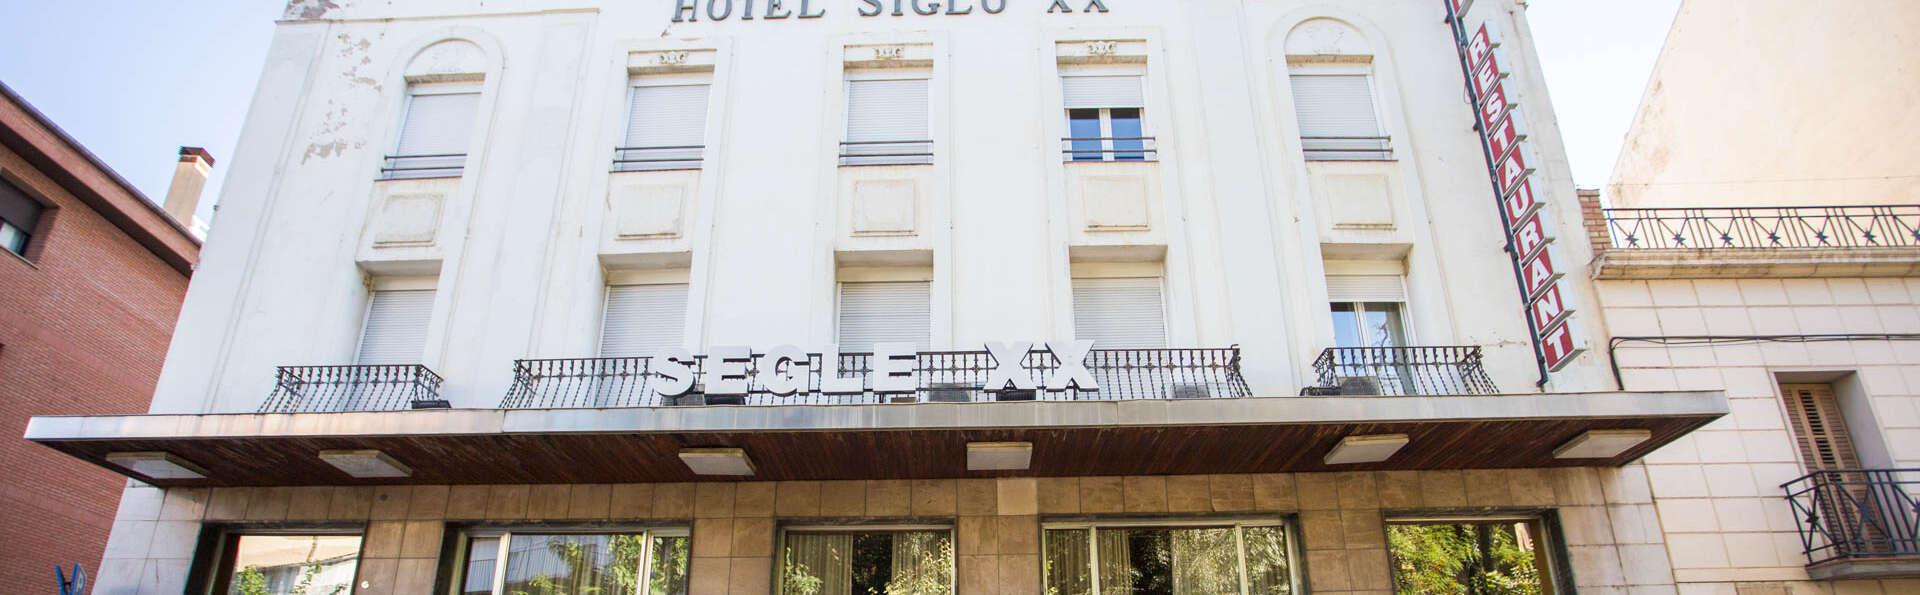 Hotel Segle XX - EDIT_NEW_FRONT.jpg